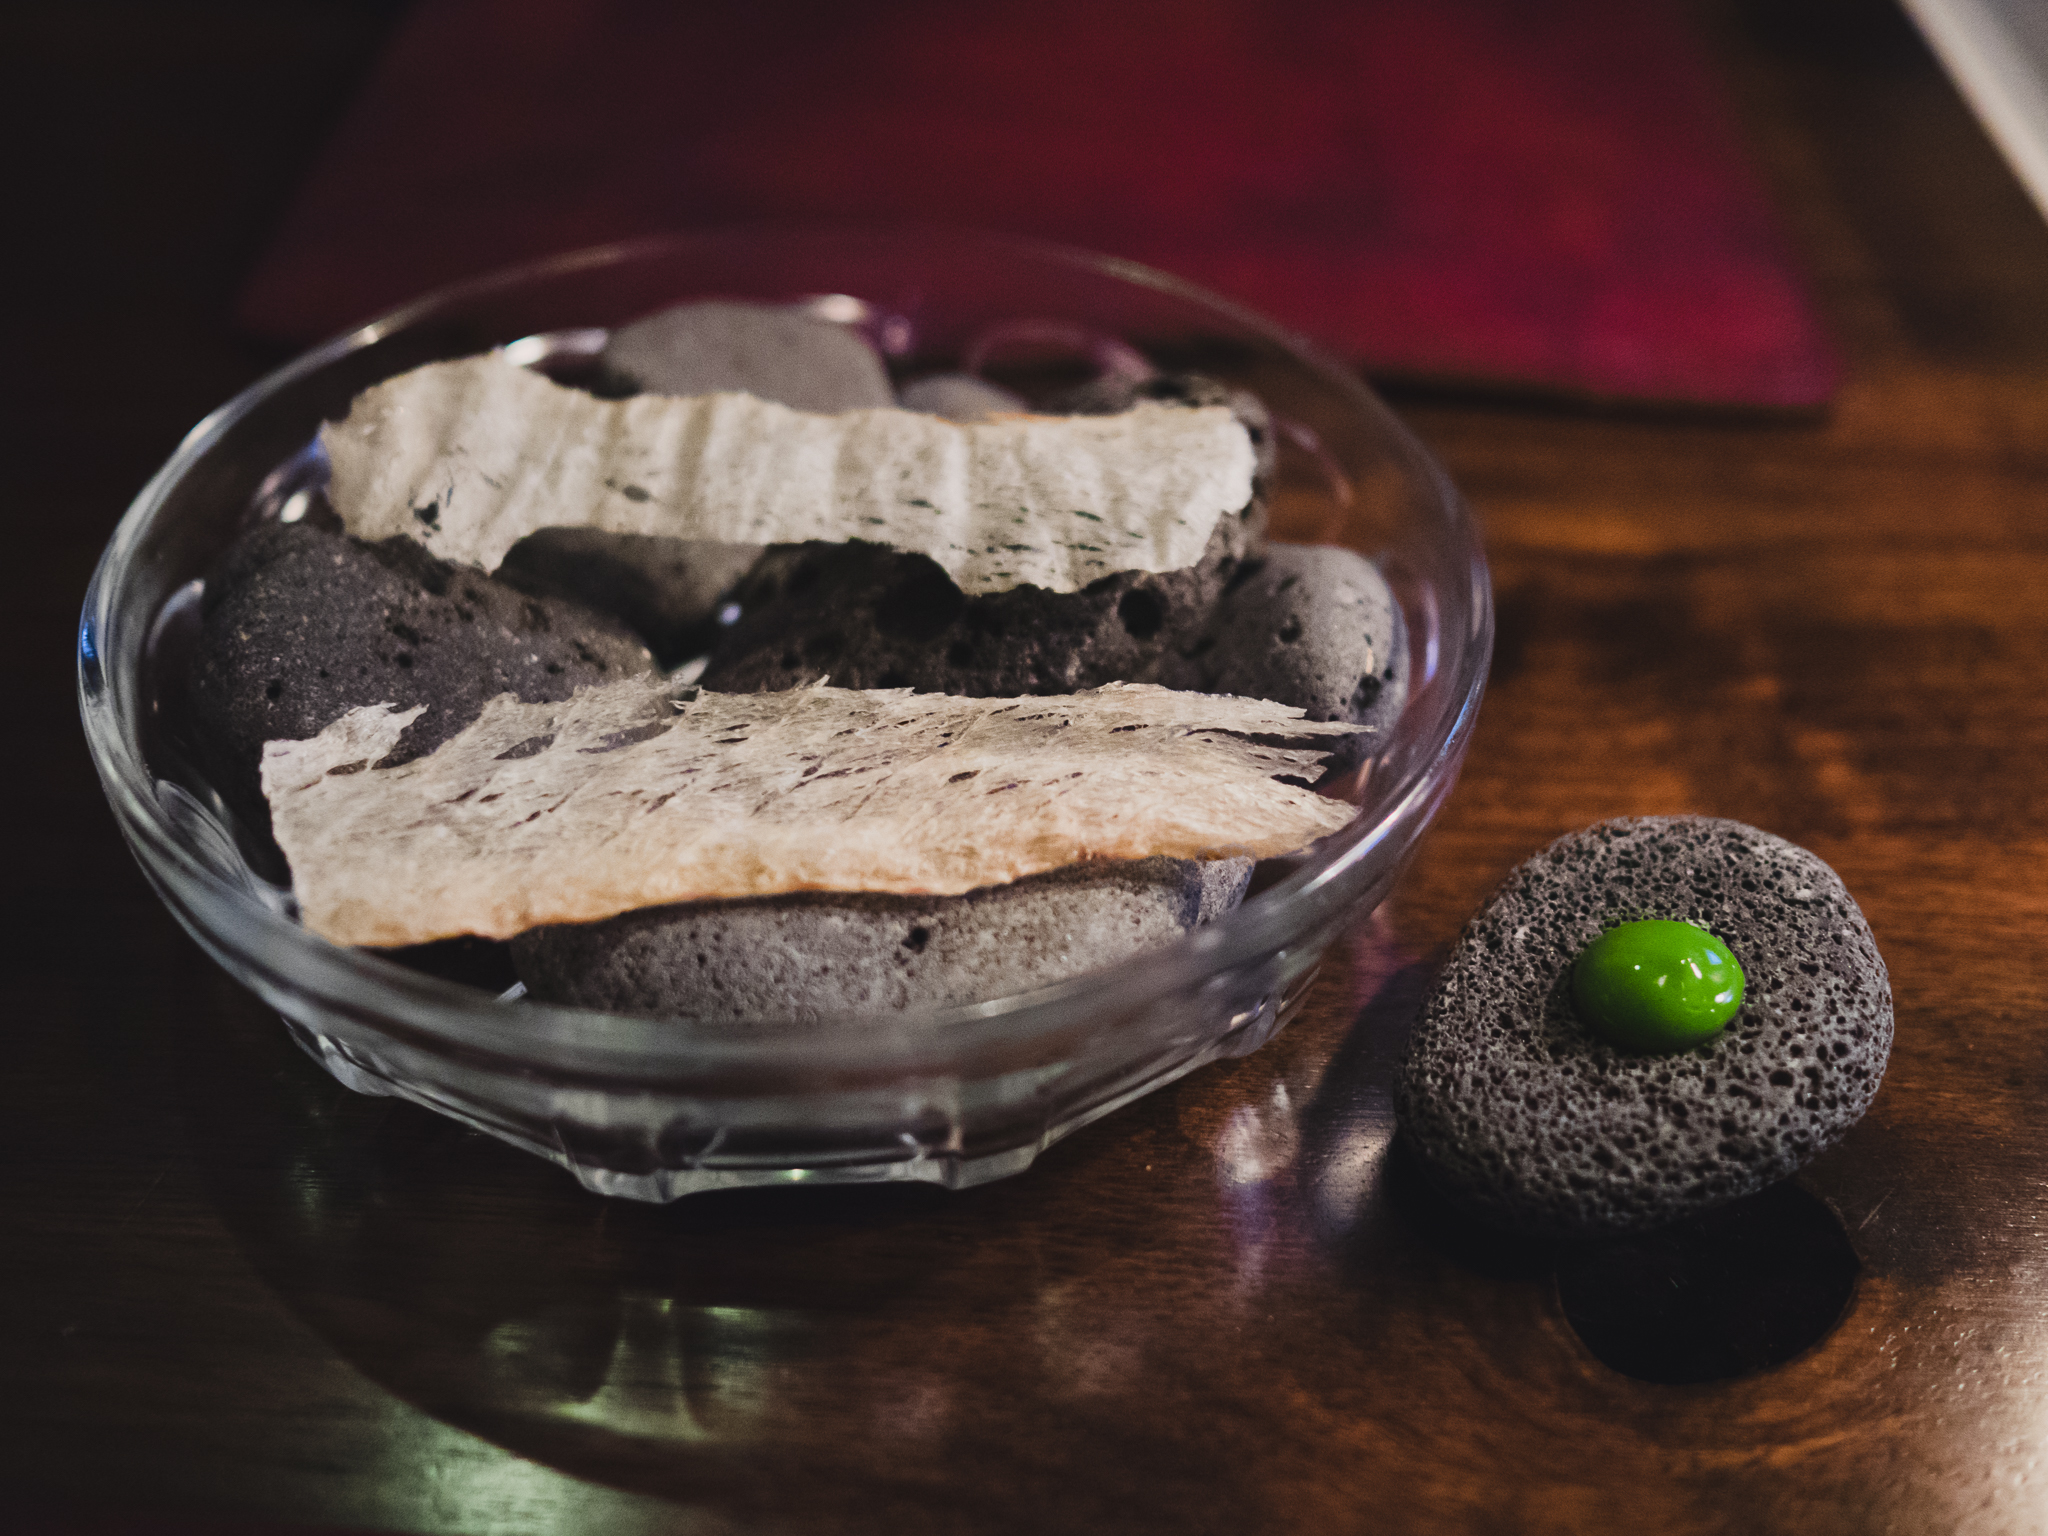 snack 03. crispy bacalao, dill.